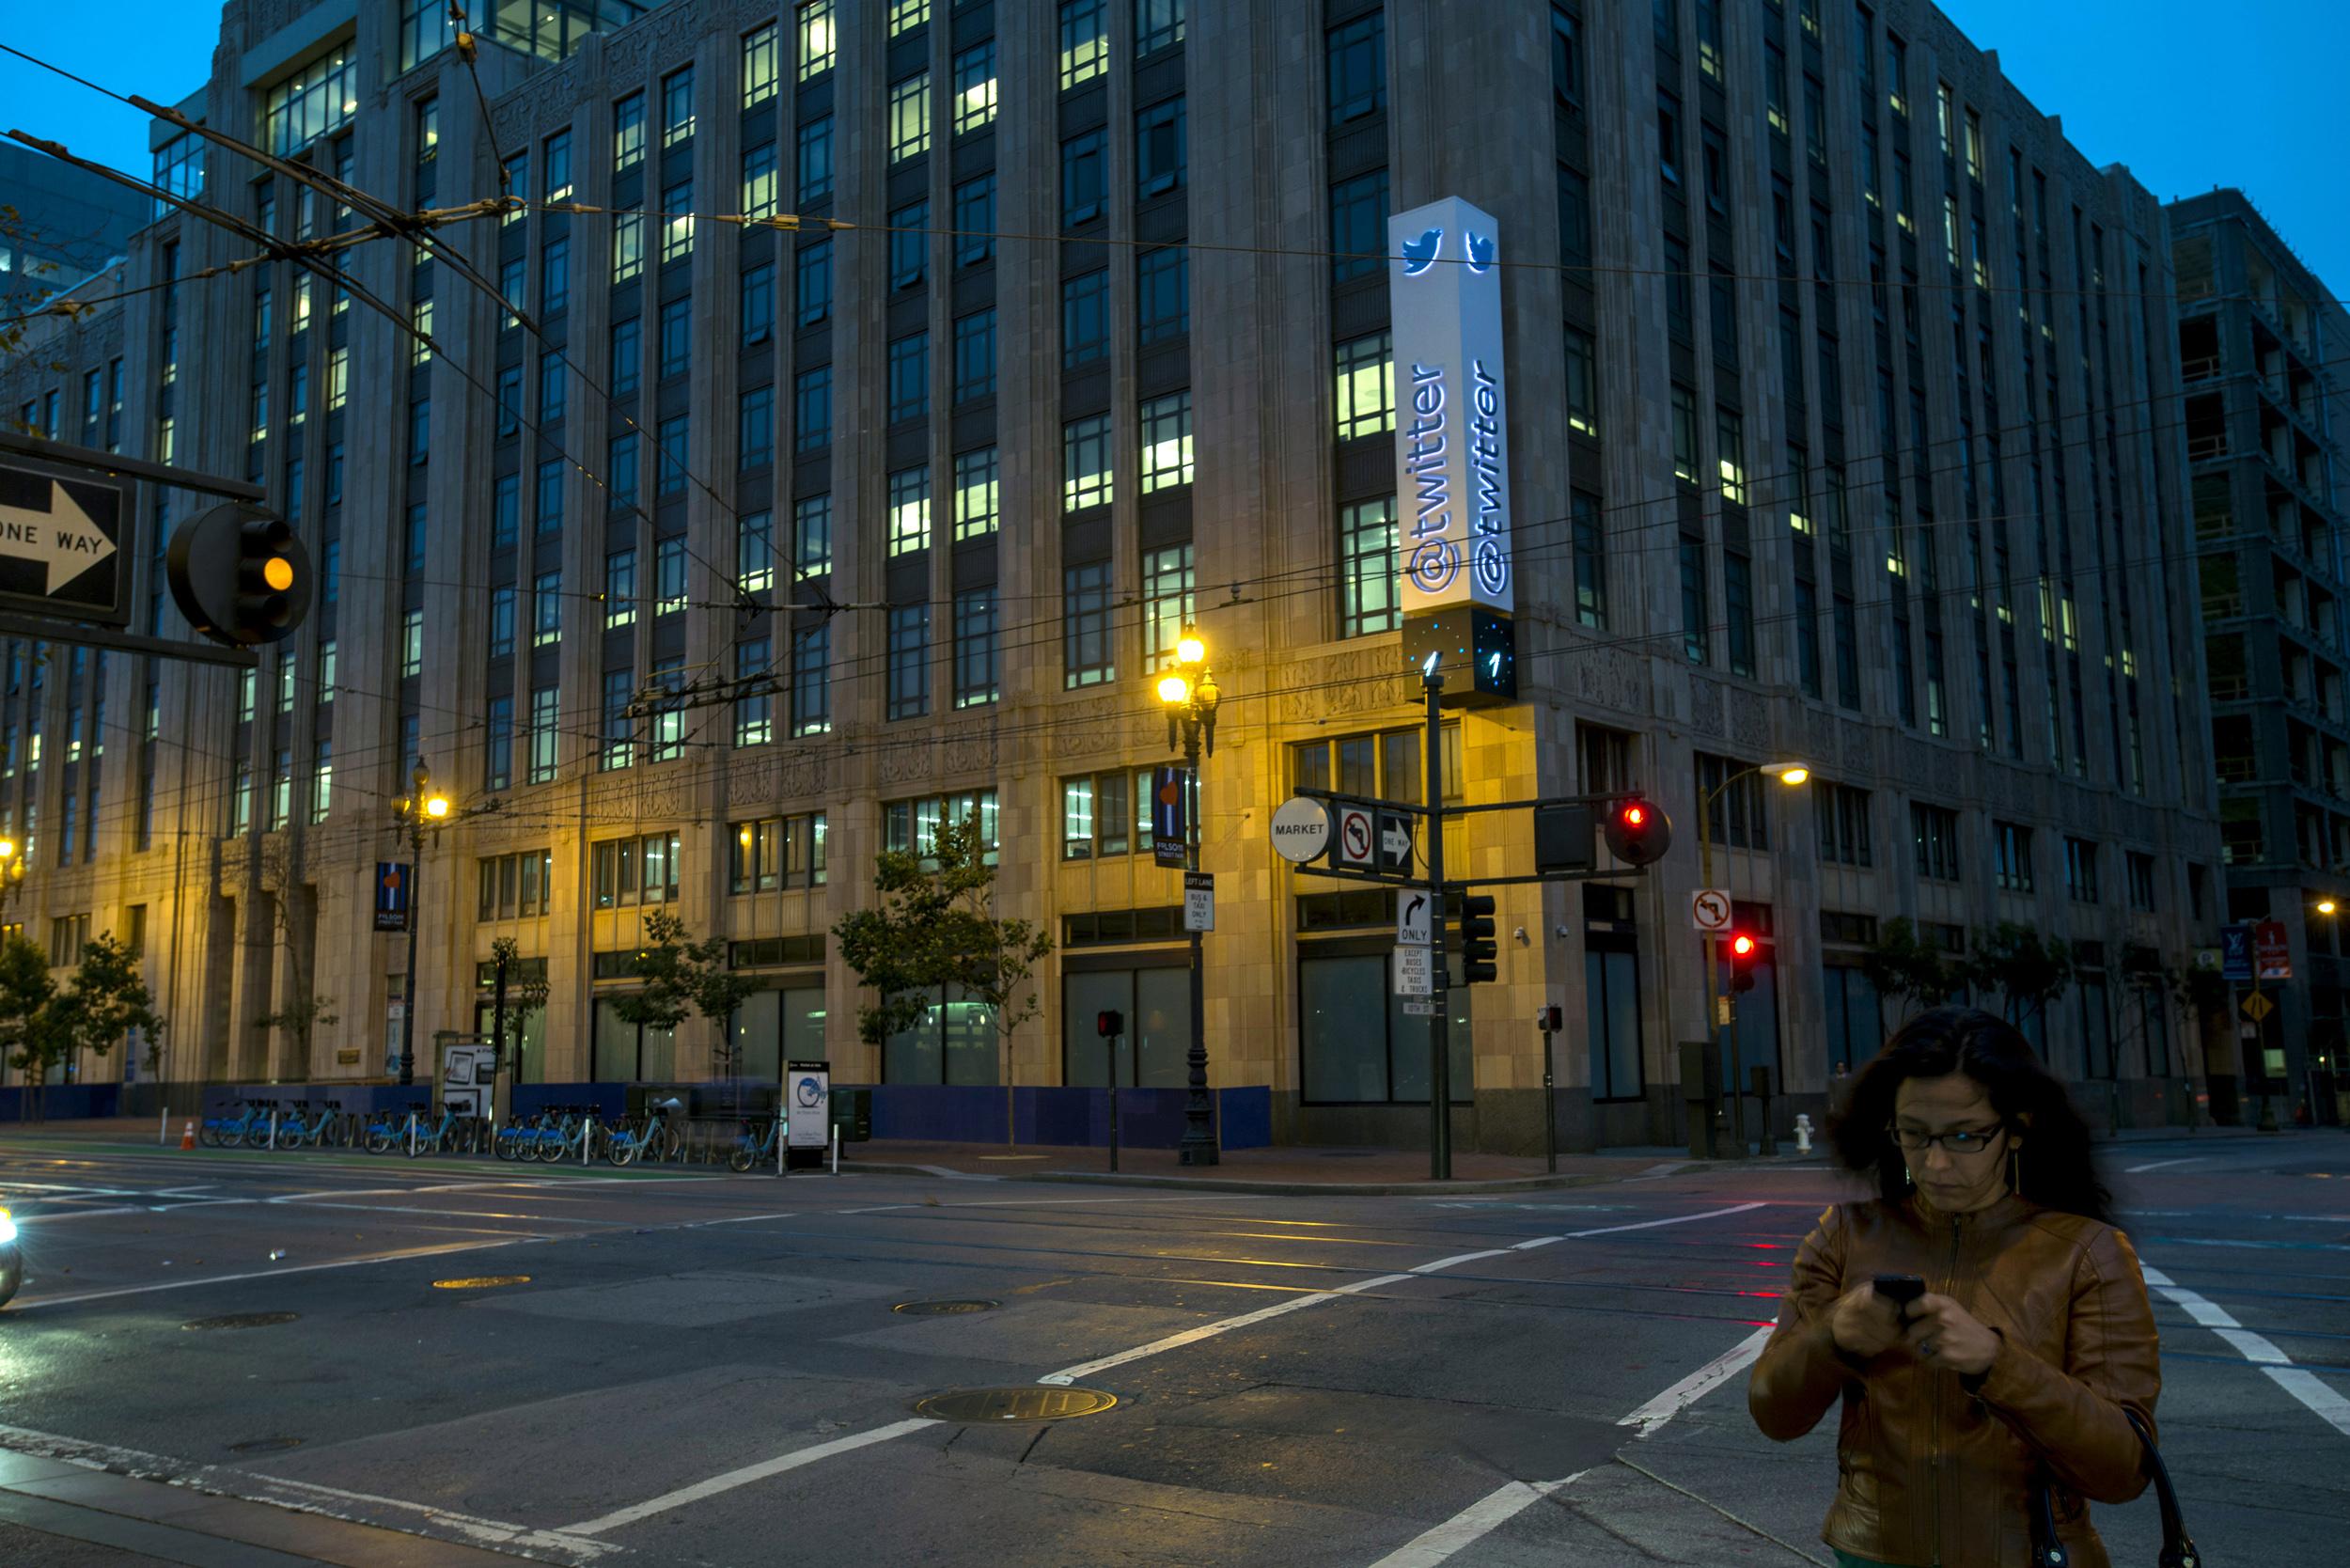 twitter san francisco office. Twitter San Francisco Office. Office A